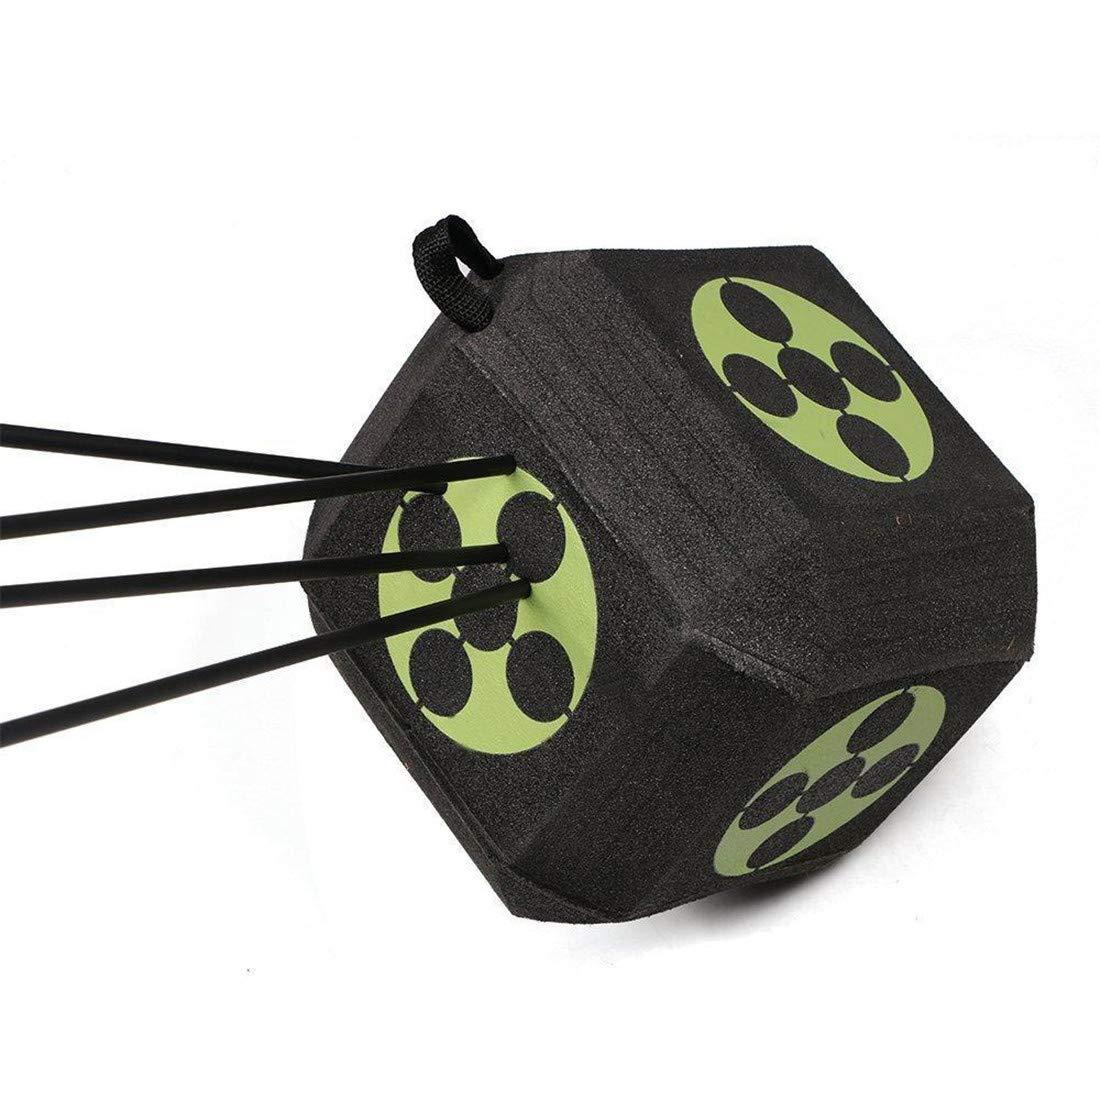 DEKA.O84 Polyhedral Self Healing Hunting Archery Backyard Cube Shooting target